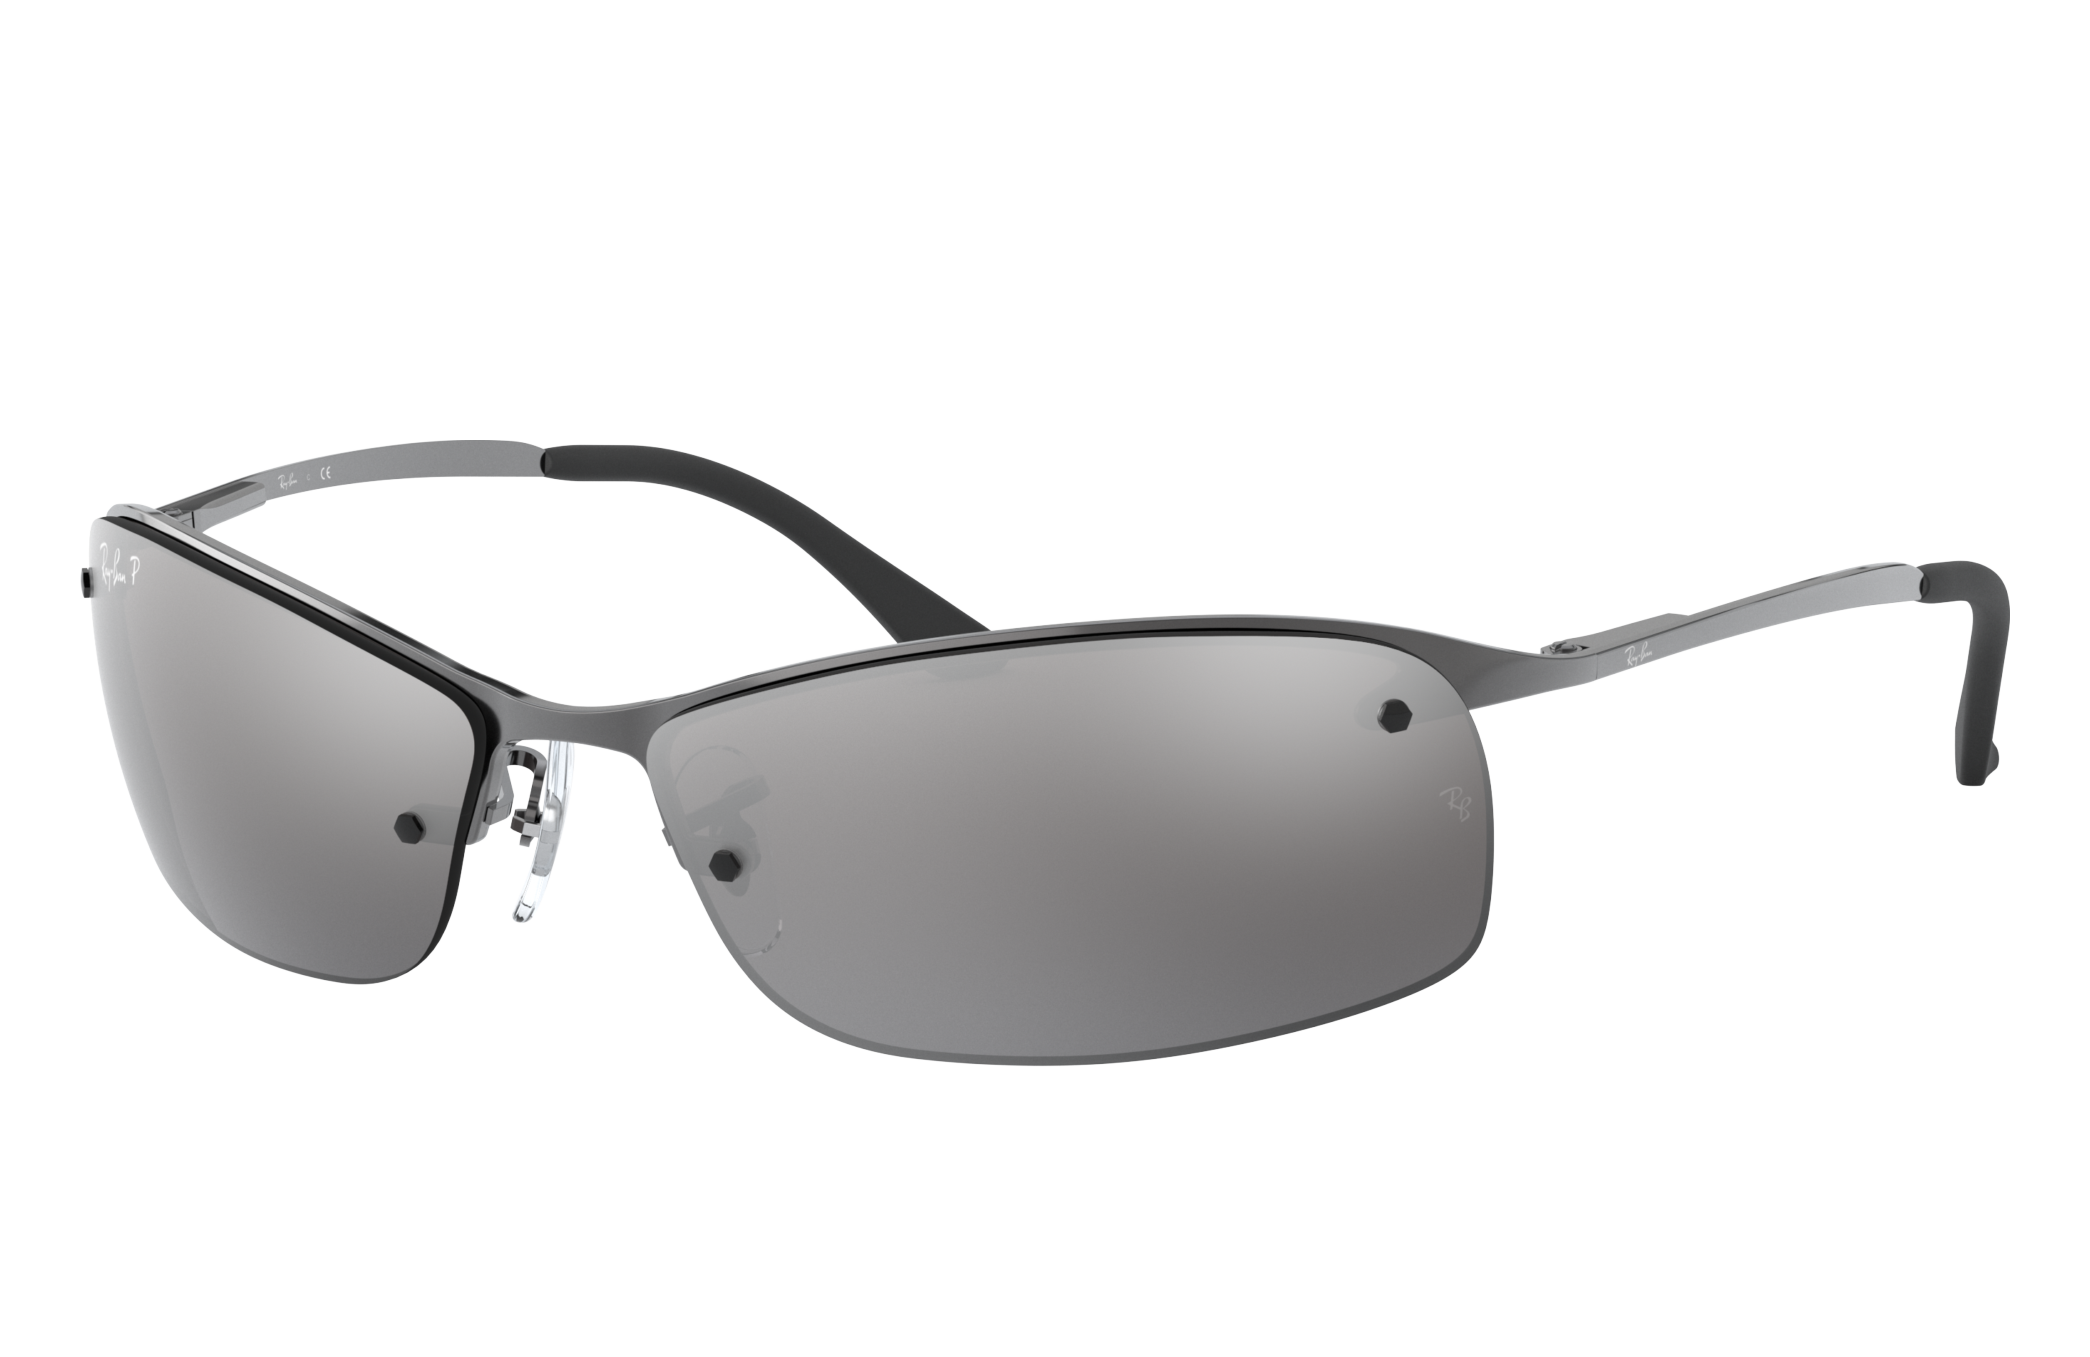 Ray-Ban Rb3183 Gunmetal, Polarized Gray Lenses - RB3183